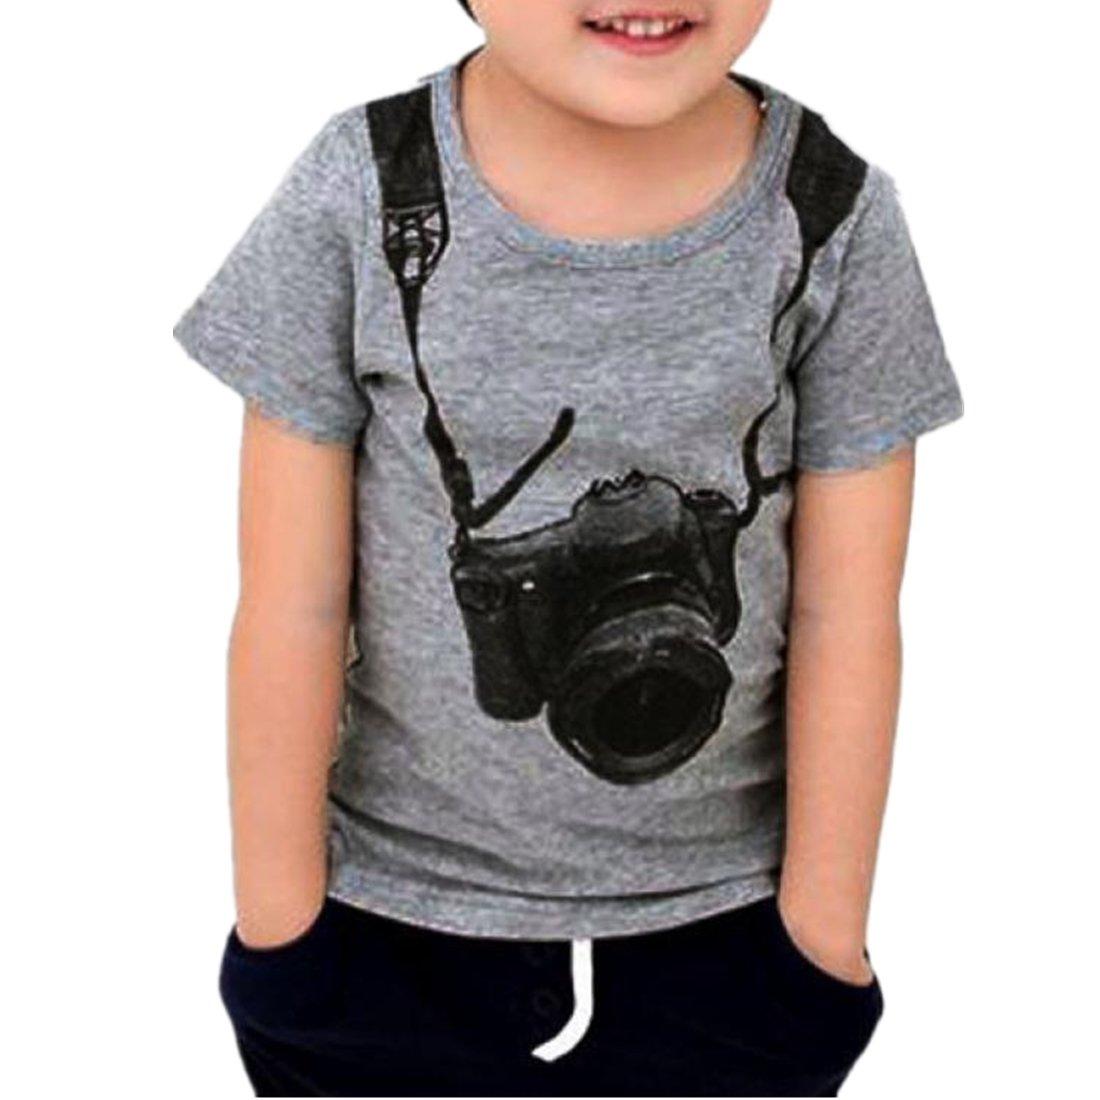 Amlaiworld Summer Boys Camera Short Sleeve Tops Amlaiworld_1271